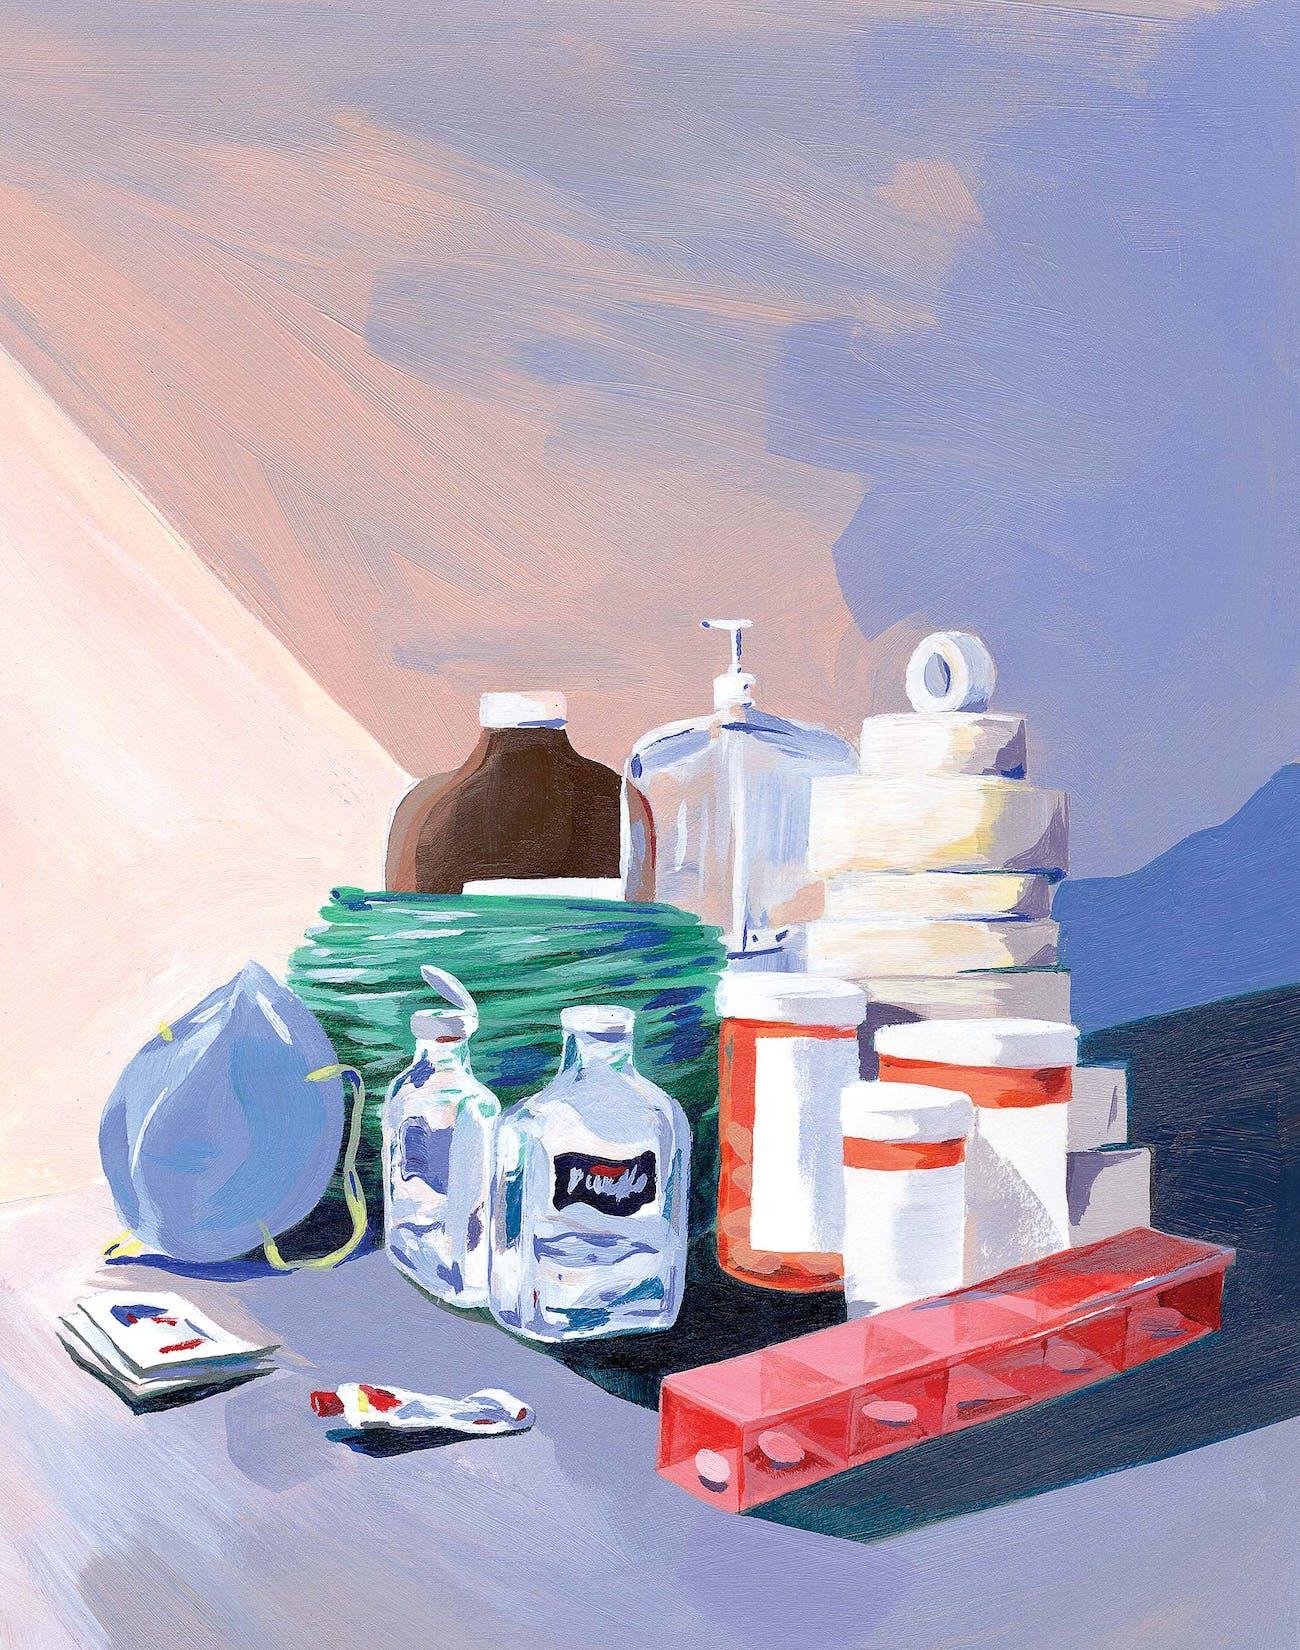 richard-santos-personal-essay-illustration-molly-snee